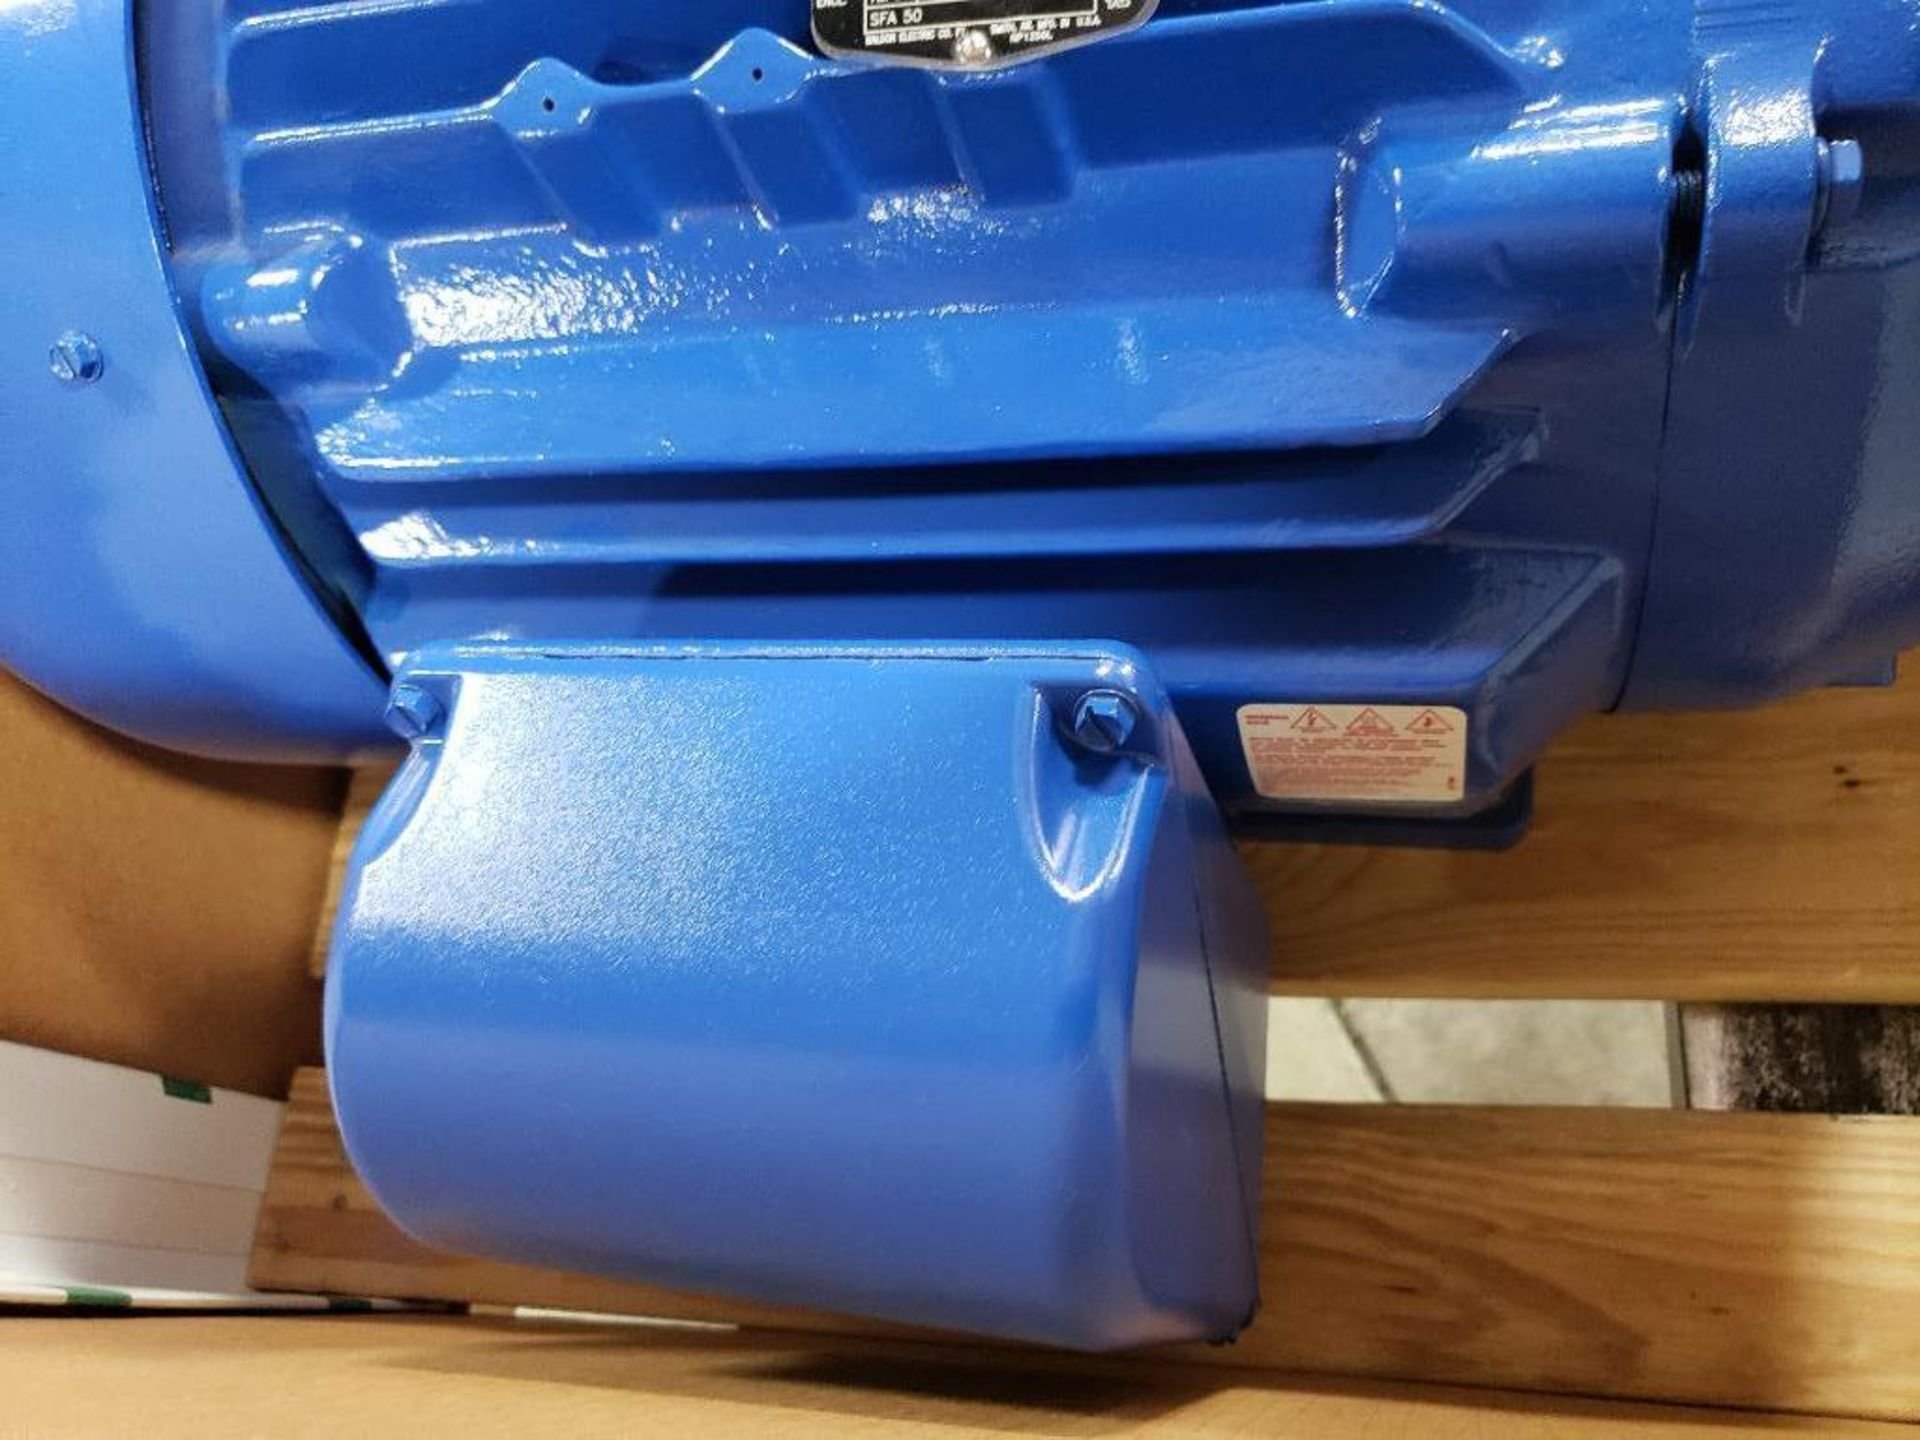 30HP Baldor Reliance 3PH motor. 2013006282. 380V, 3530RPM, 284TSC-Frame. - Image 6 of 8